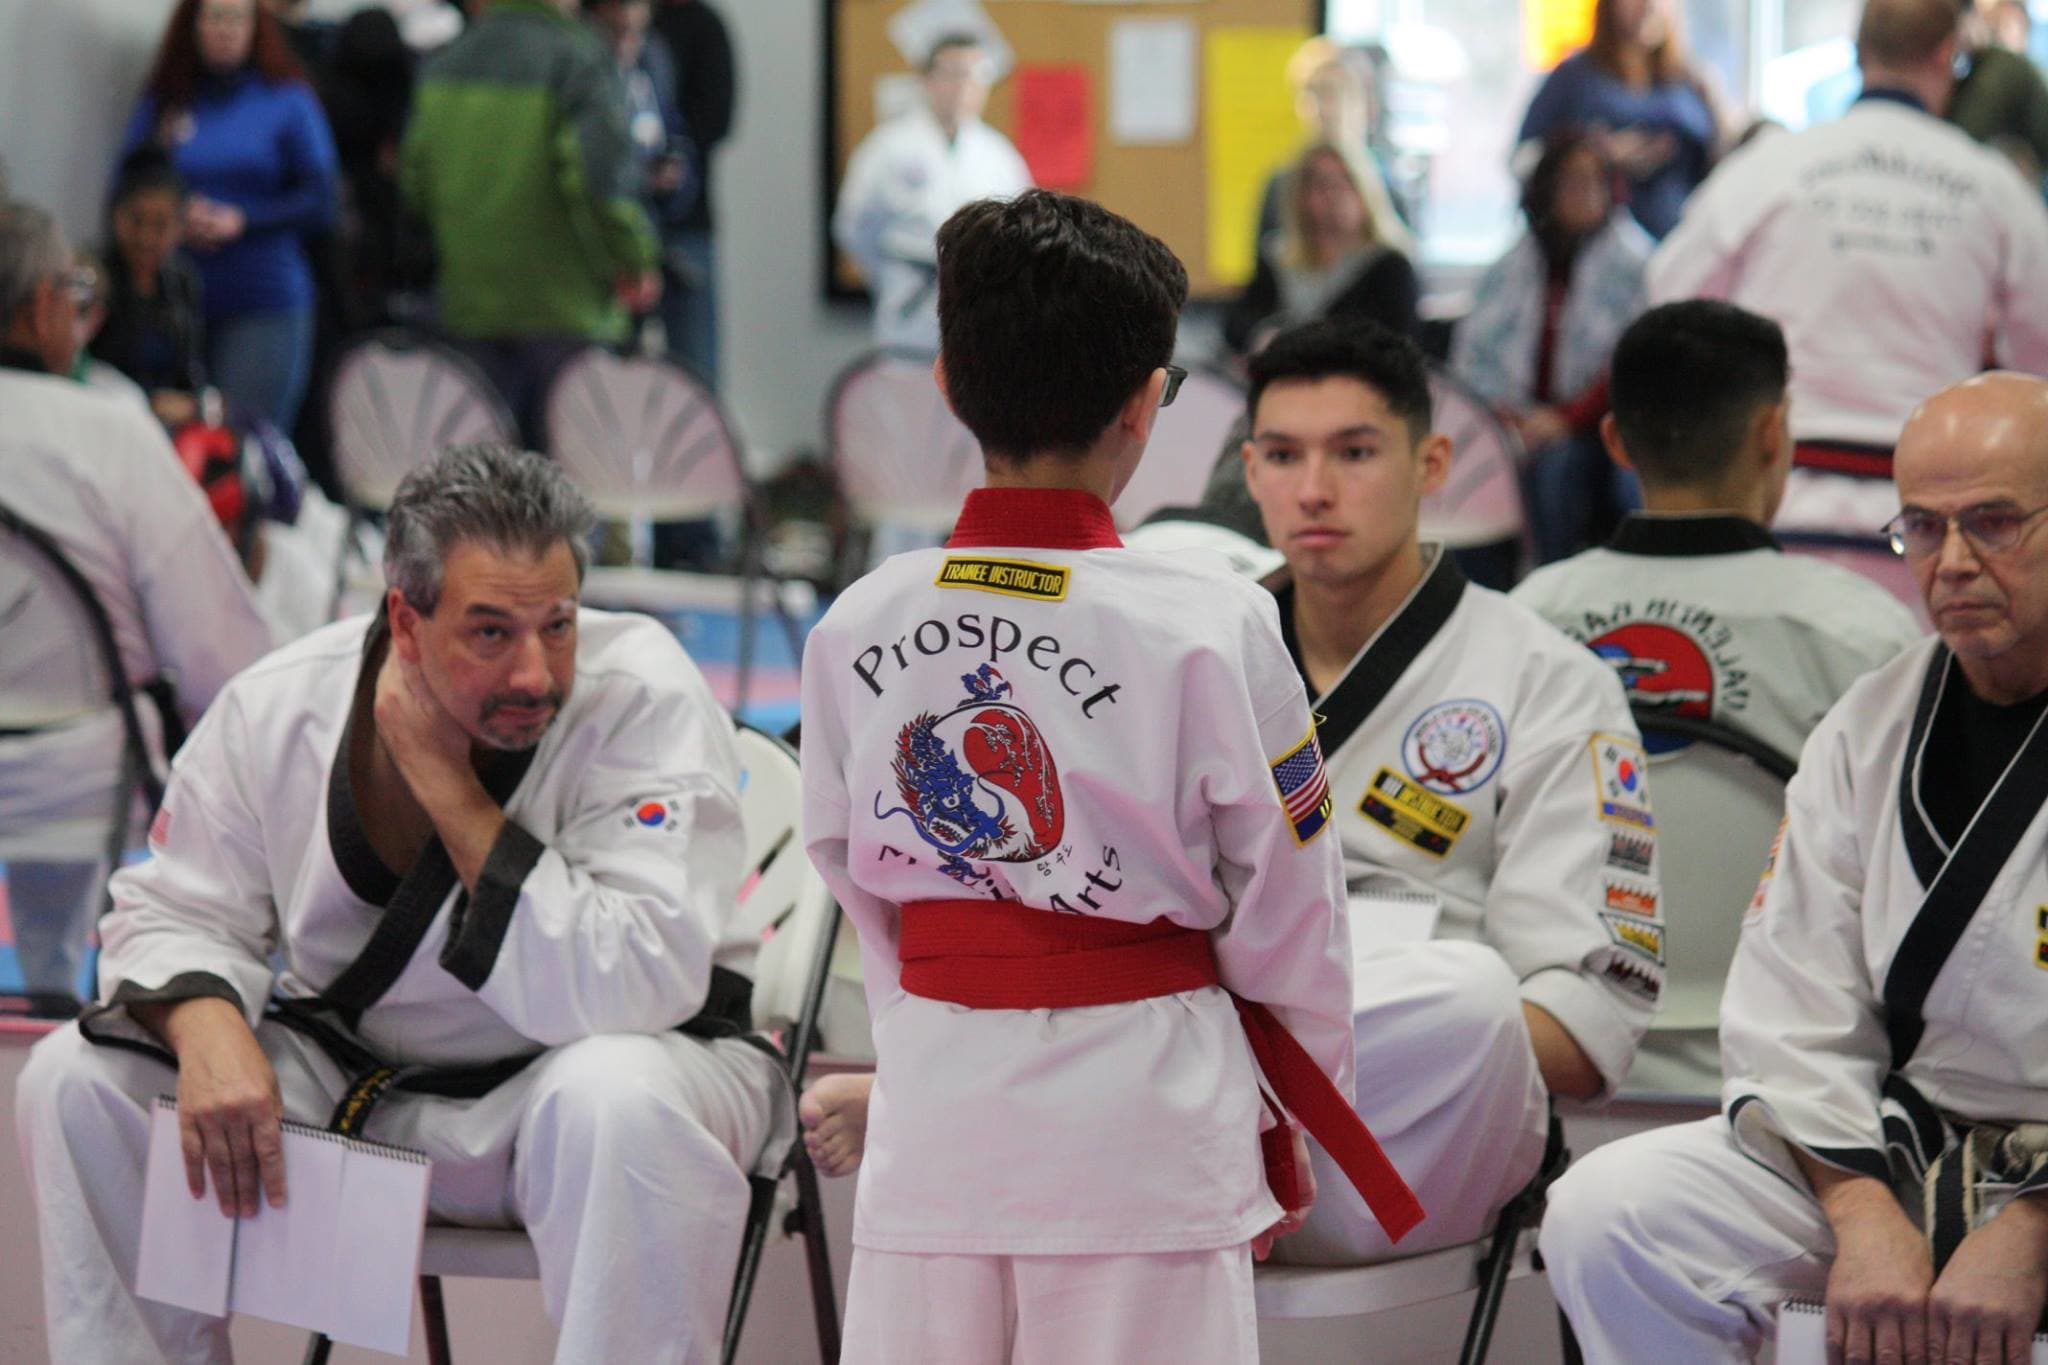 Prospect Kids Martial Arts